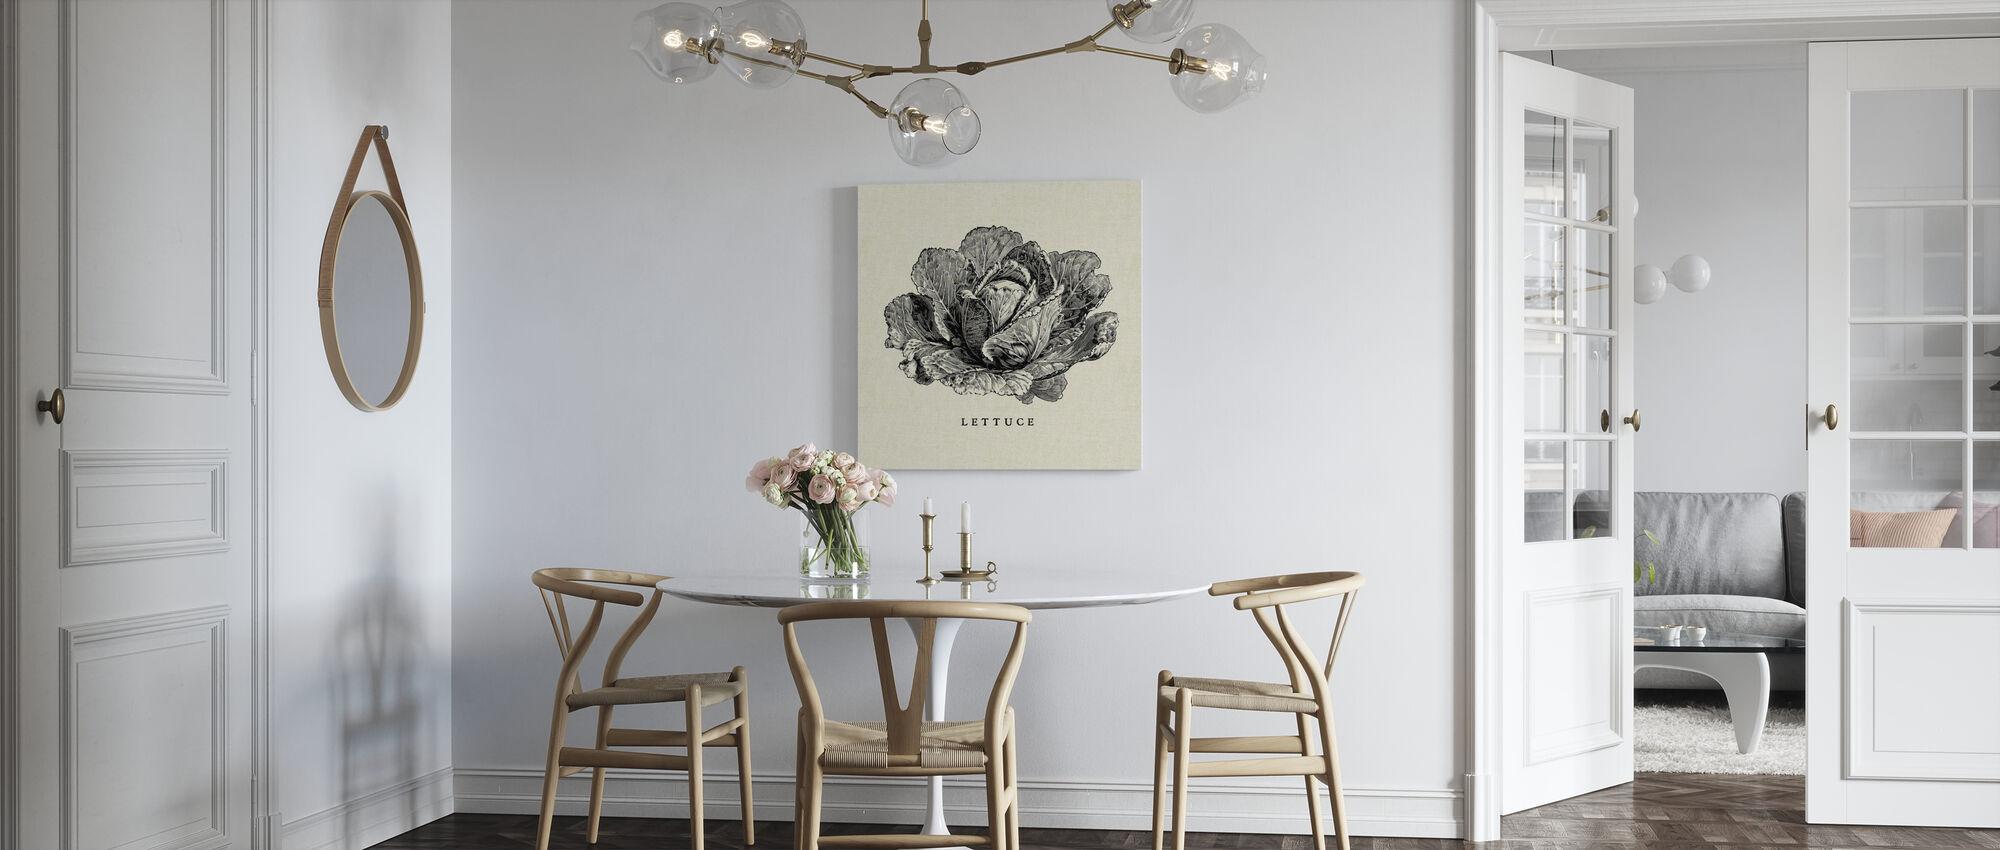 Kitchen Illustration - Lettuce - Canvas print - Kitchen